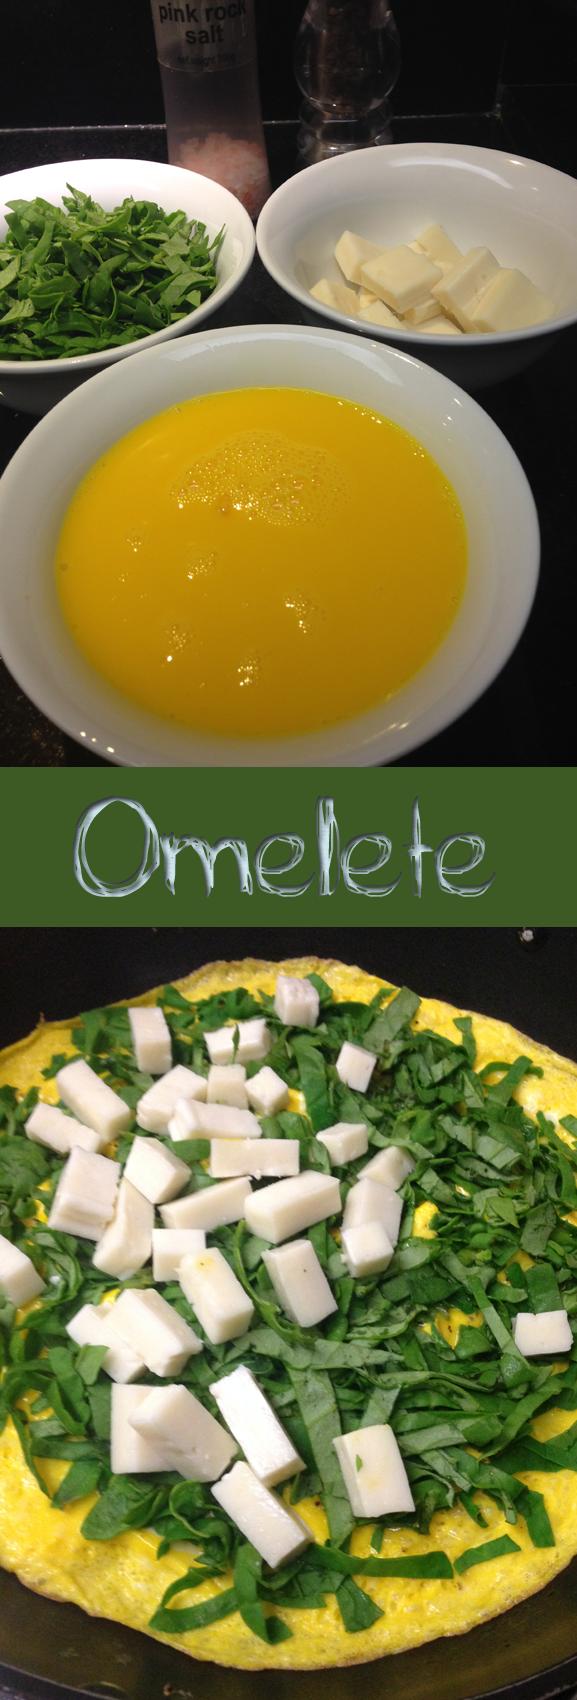 maridonacozinha_receita_omelete